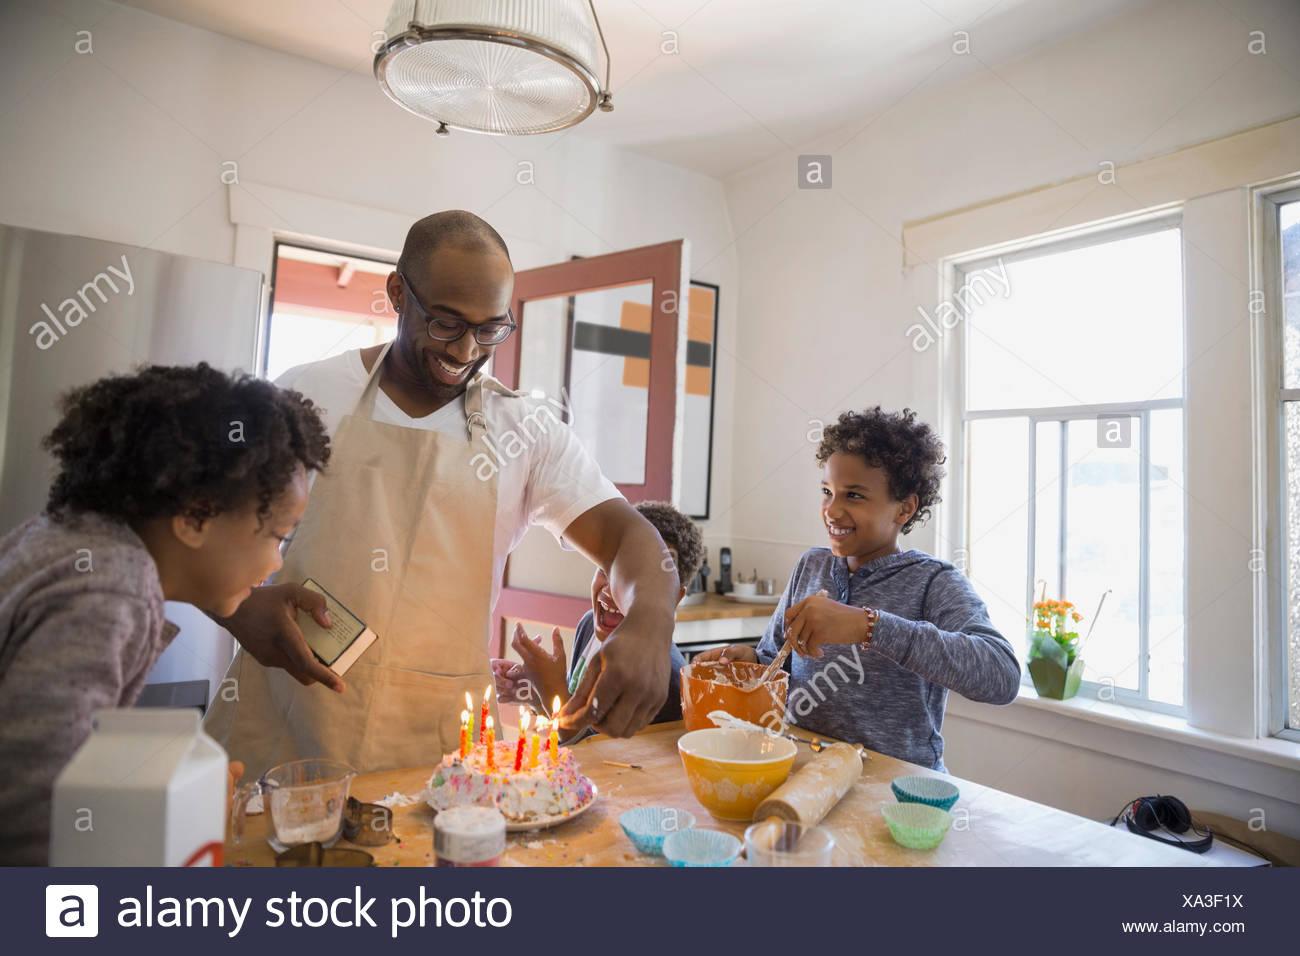 Father and children preparing birthday cake - Stock Image